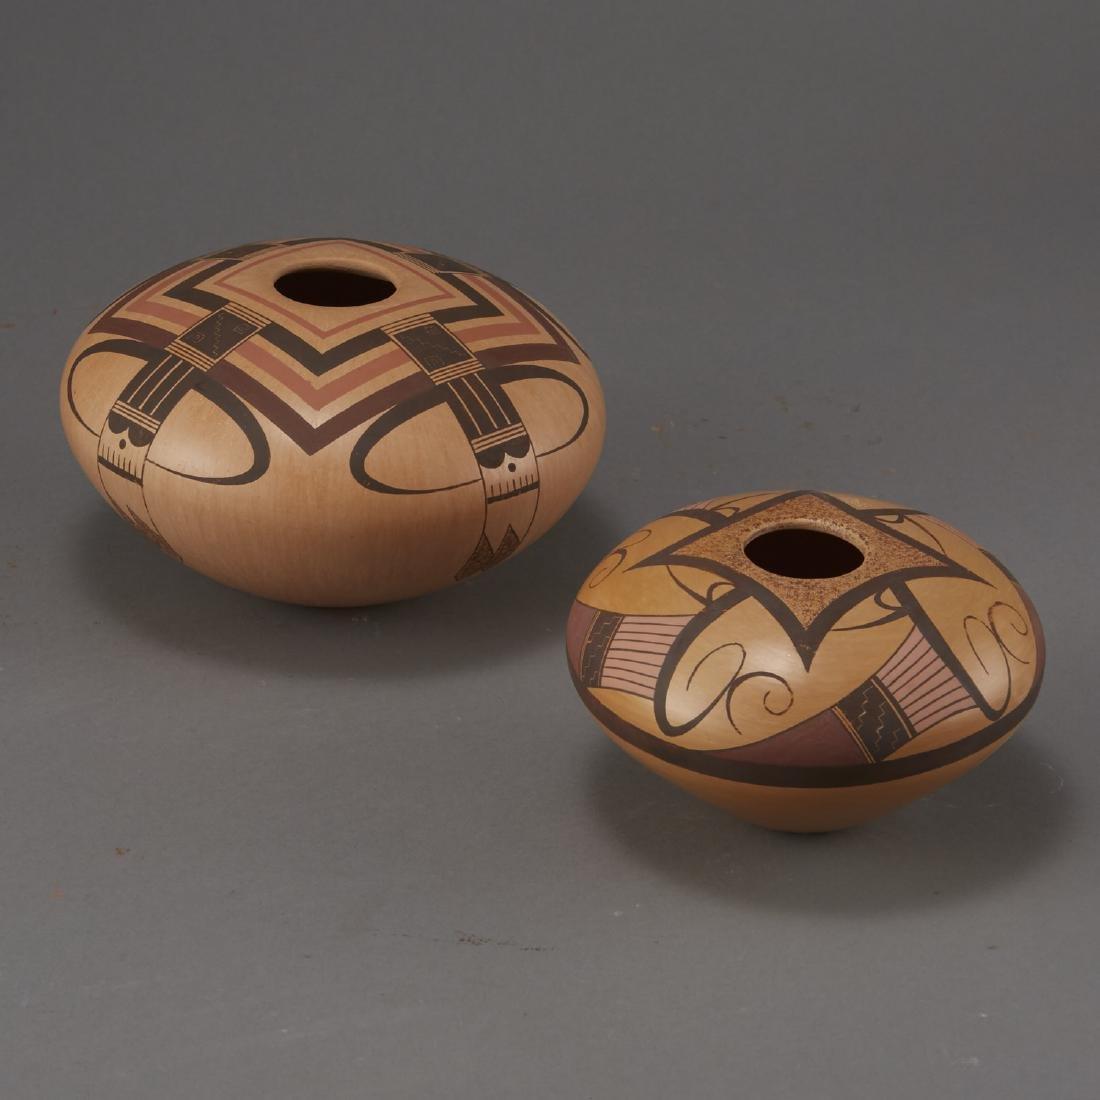 2 Jacob Nampeyo Koopee Polychrome Jars